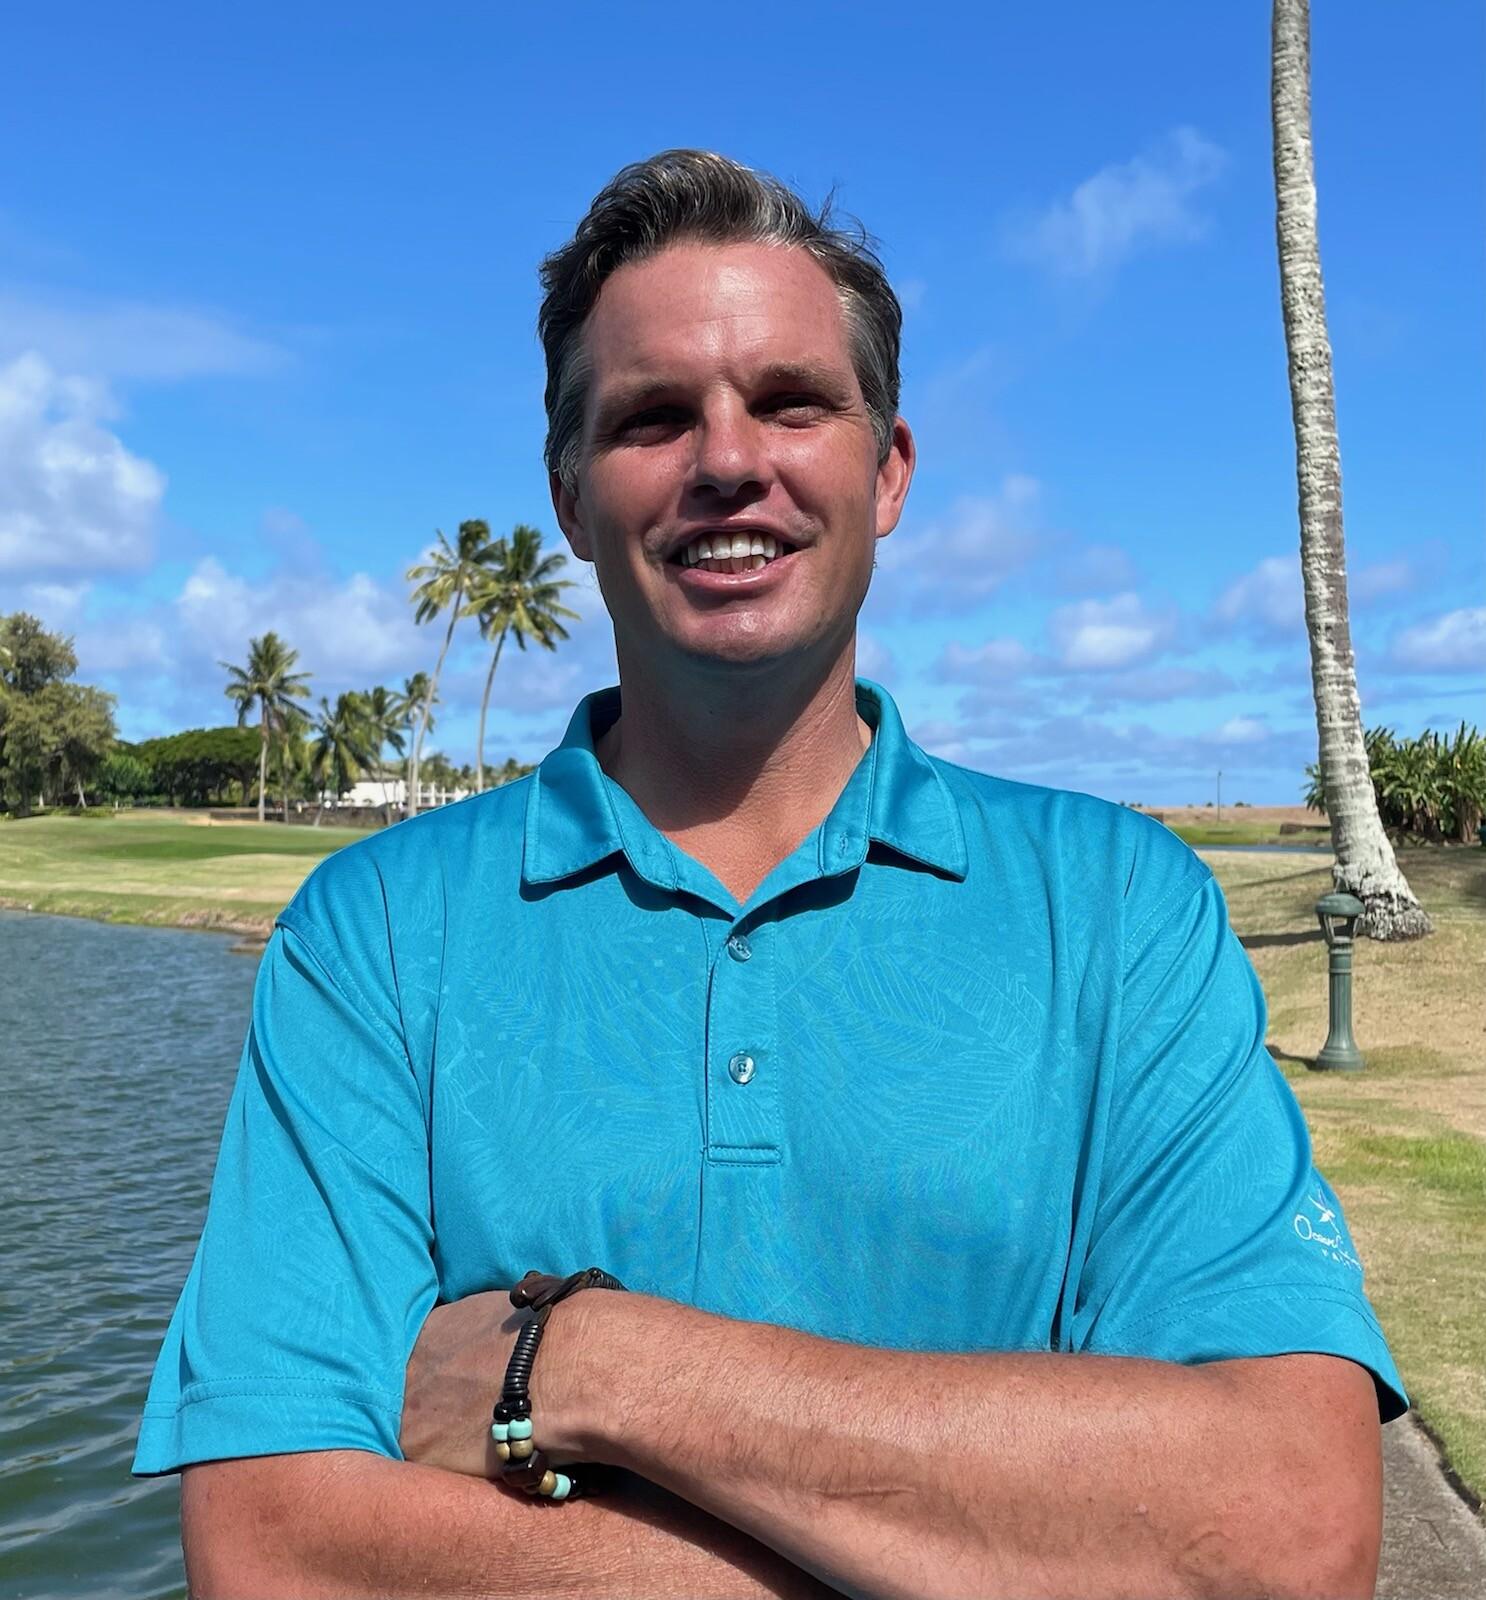 Thomas Freestone PGA Director of Operations at Ocean Course Hokuala